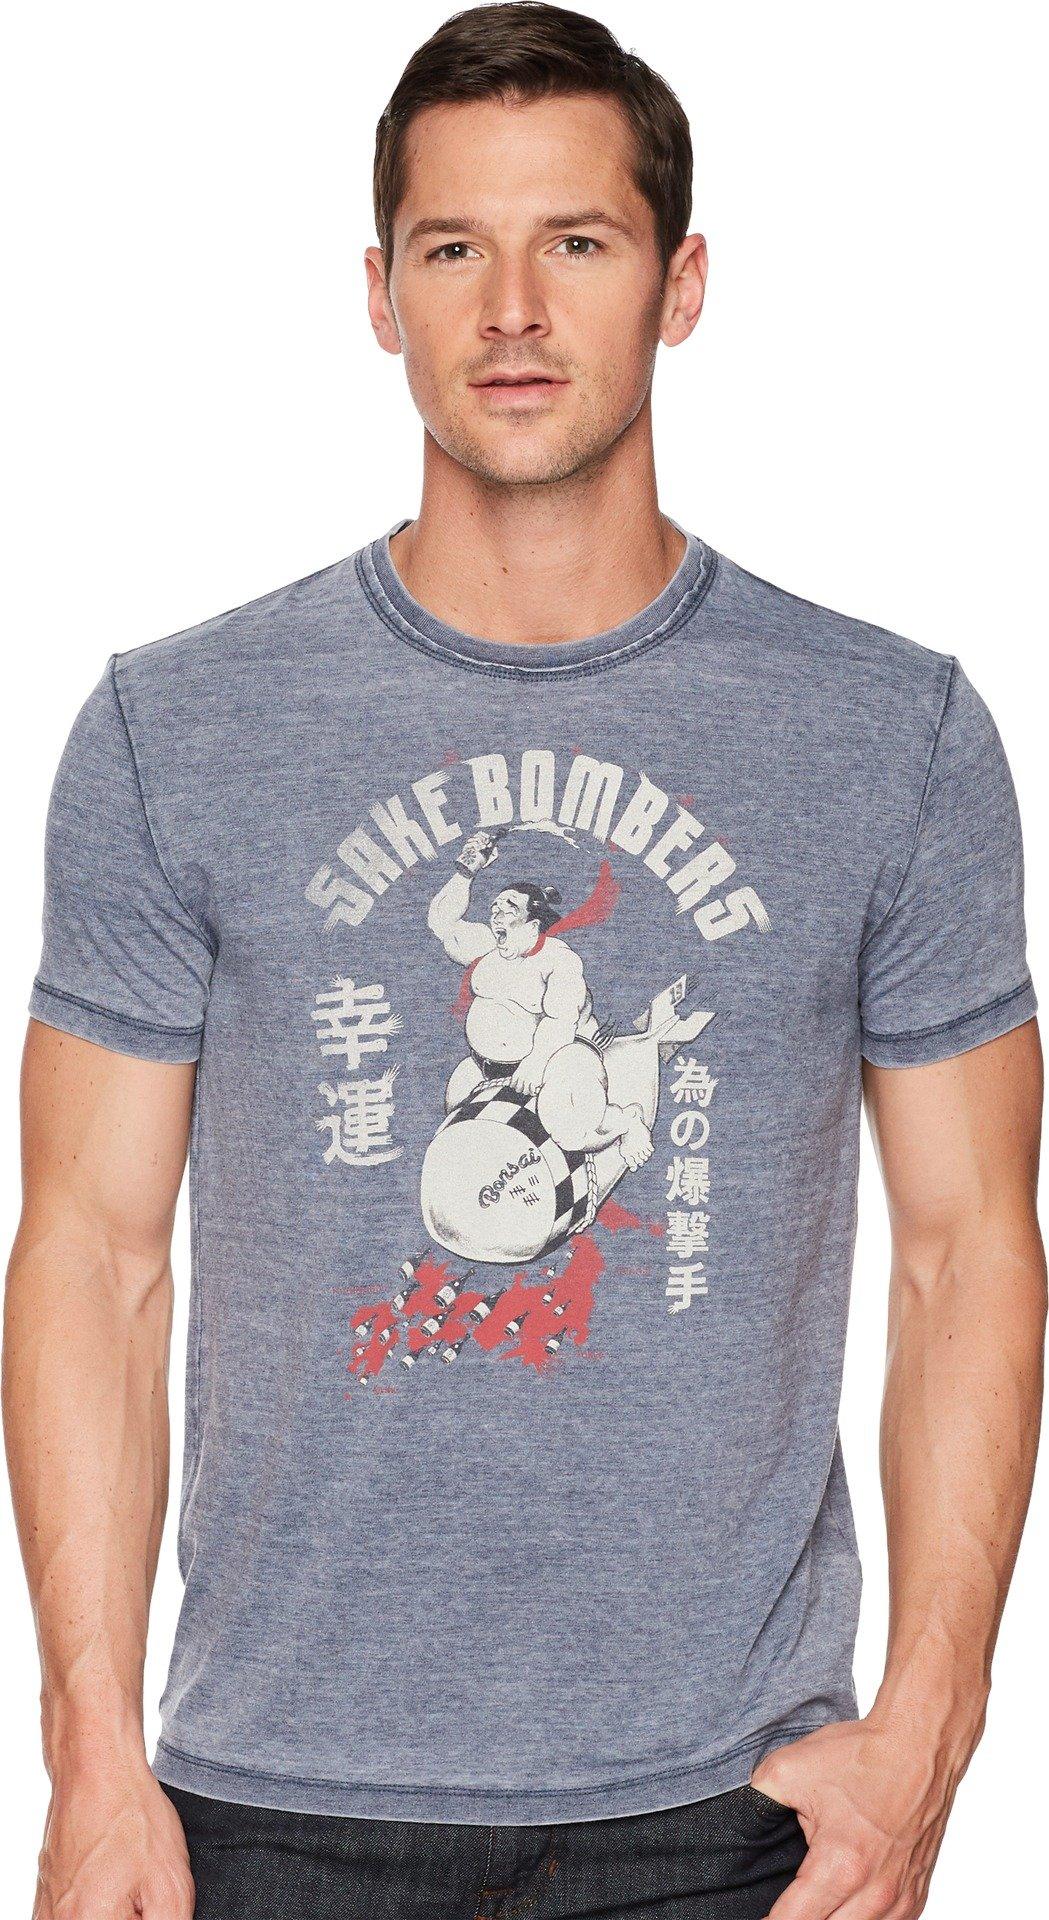 Lucky Brand Men's Sake Bomb Graphic TEE, American Navy, M